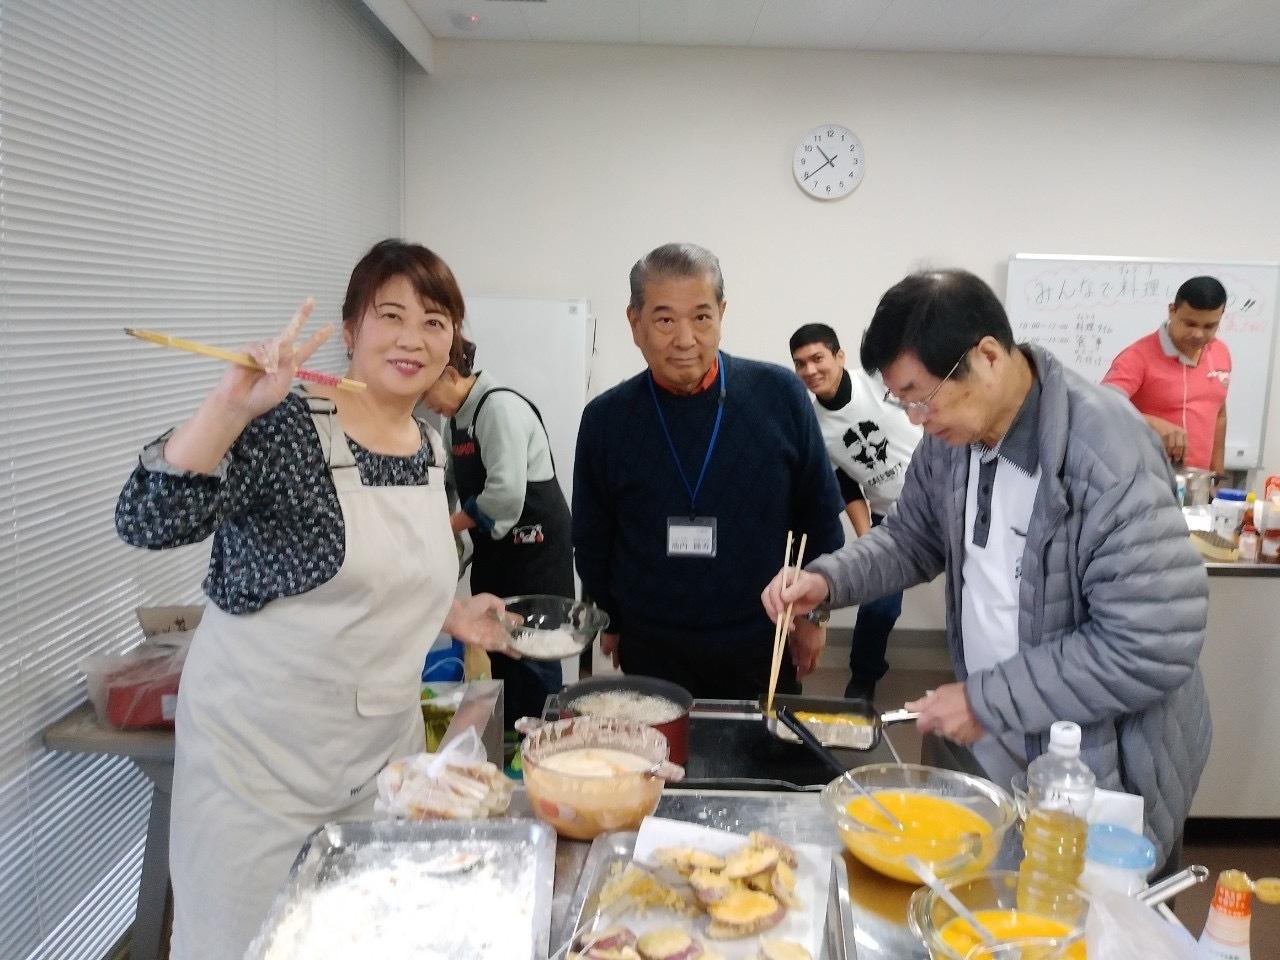 私の国の料理ー火曜夜教室_e0175020_15551621.jpg